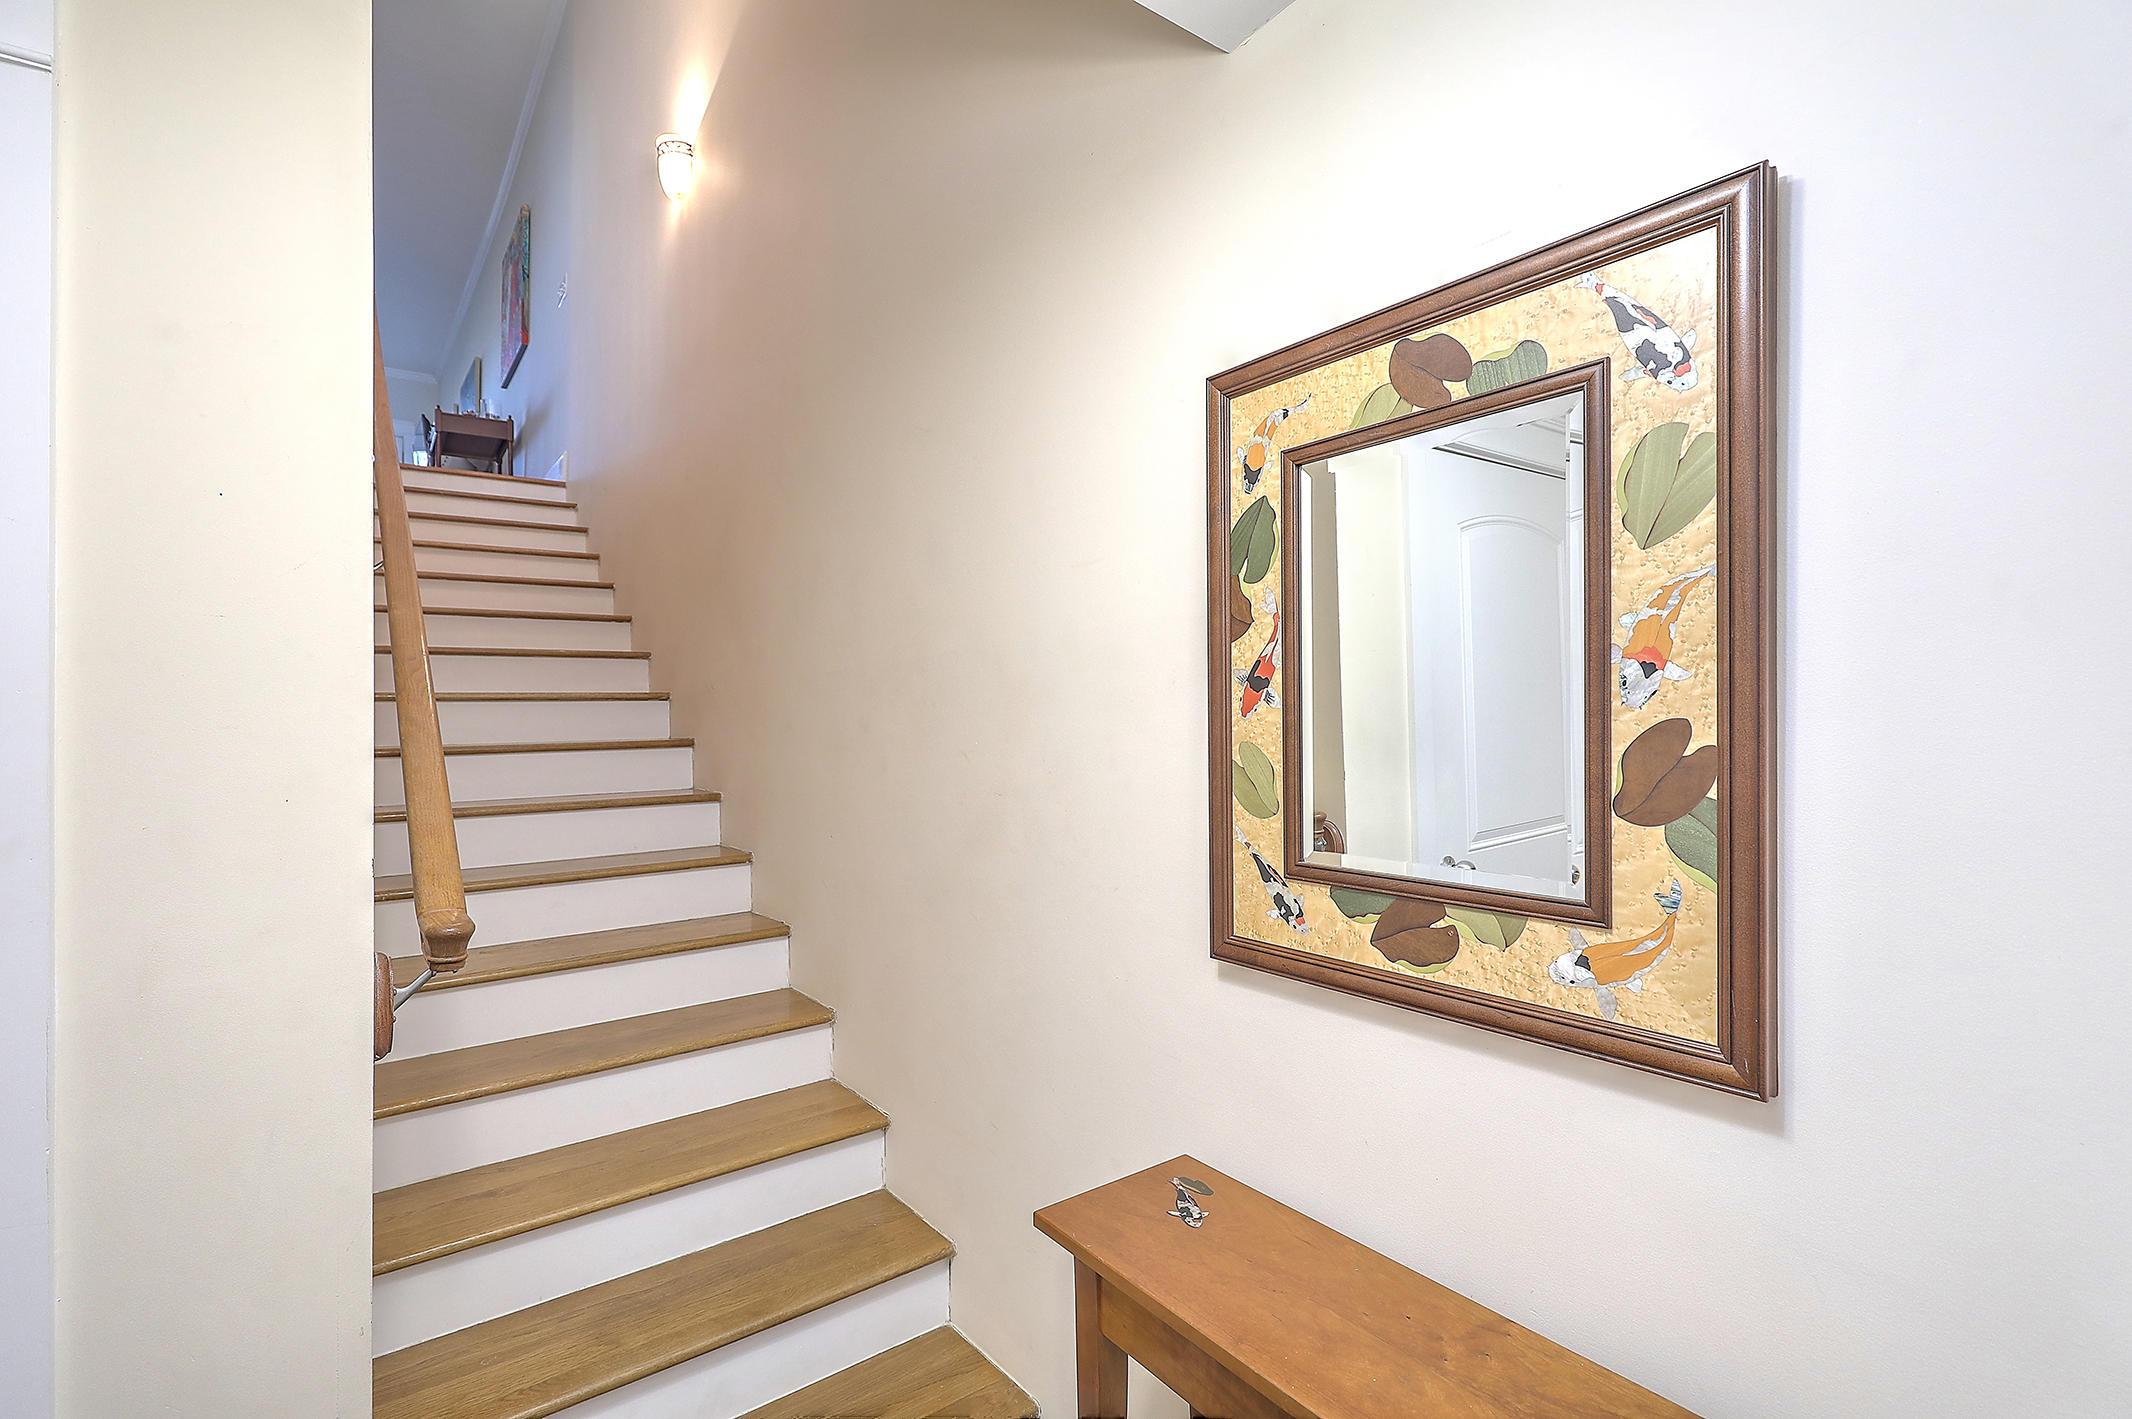 Etiwan Pointe Homes For Sale - 124 Winding Creek, Mount Pleasant, SC - 11